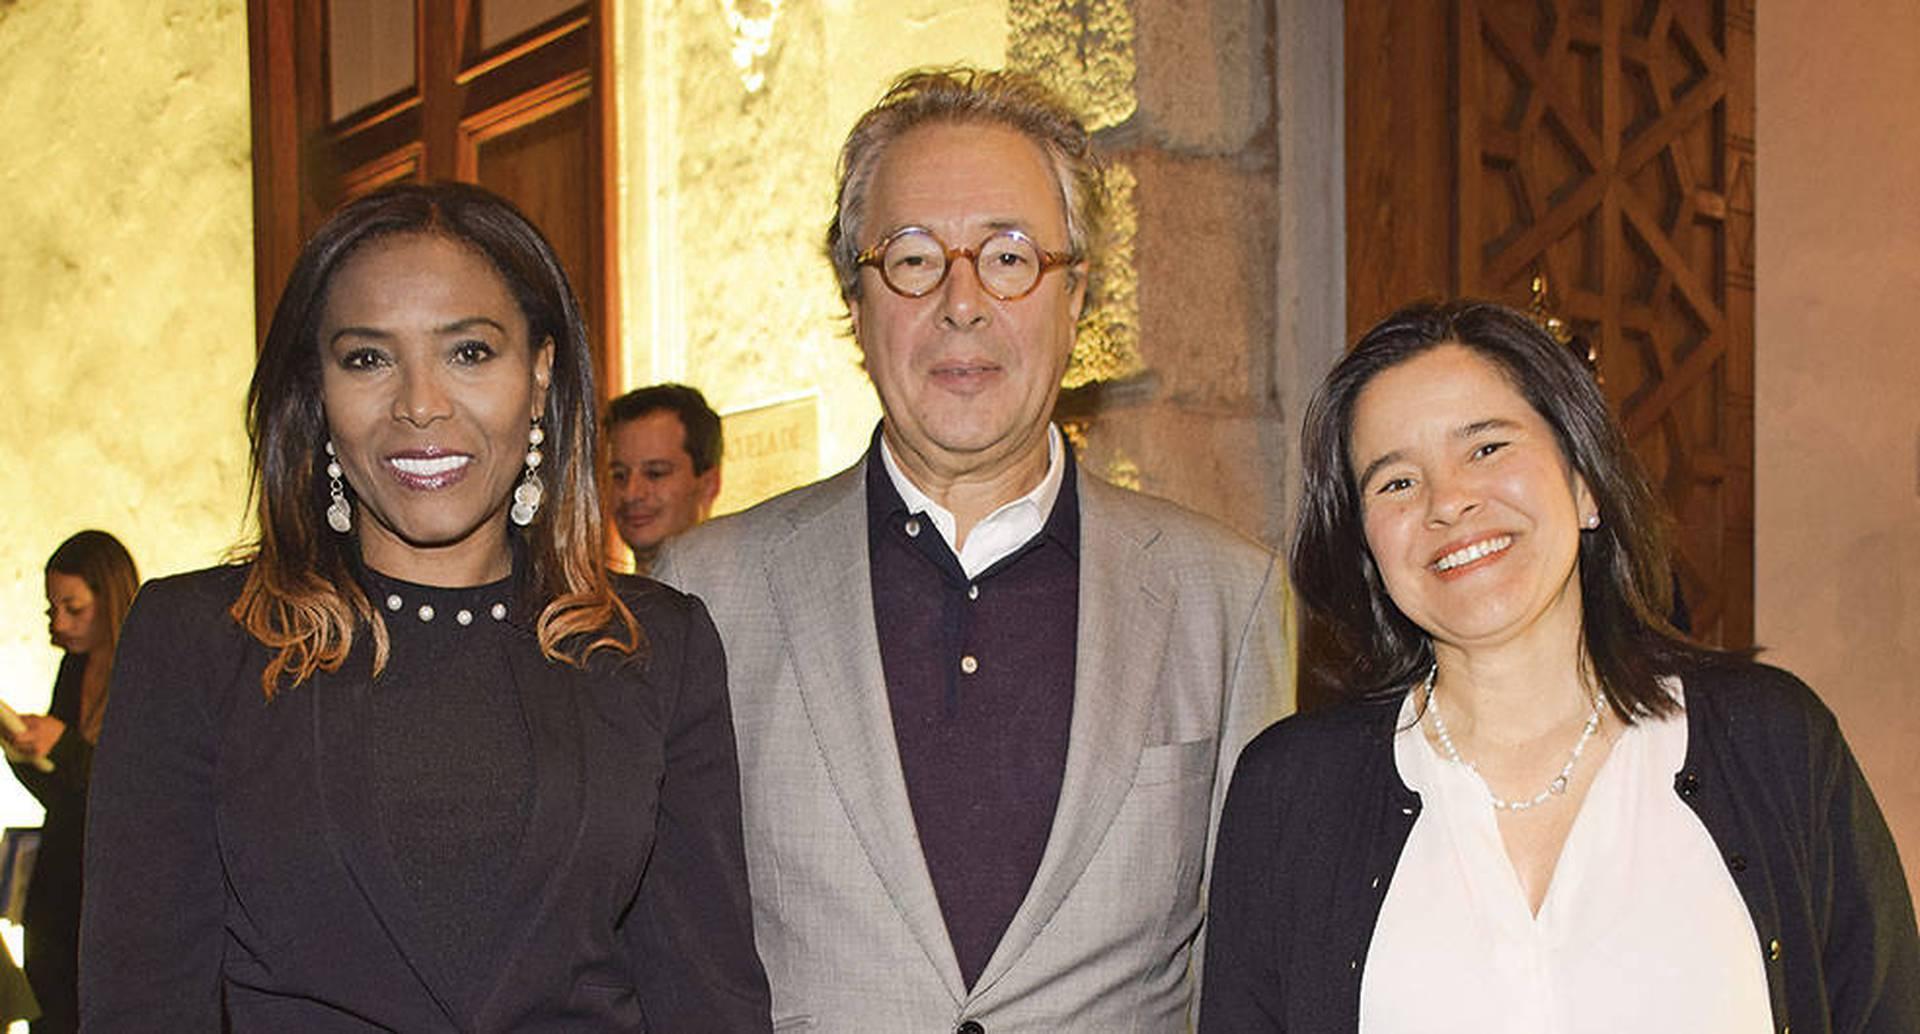 Carmen Vásquez, Gonzalo Córdoba y Sylvia Constaín.